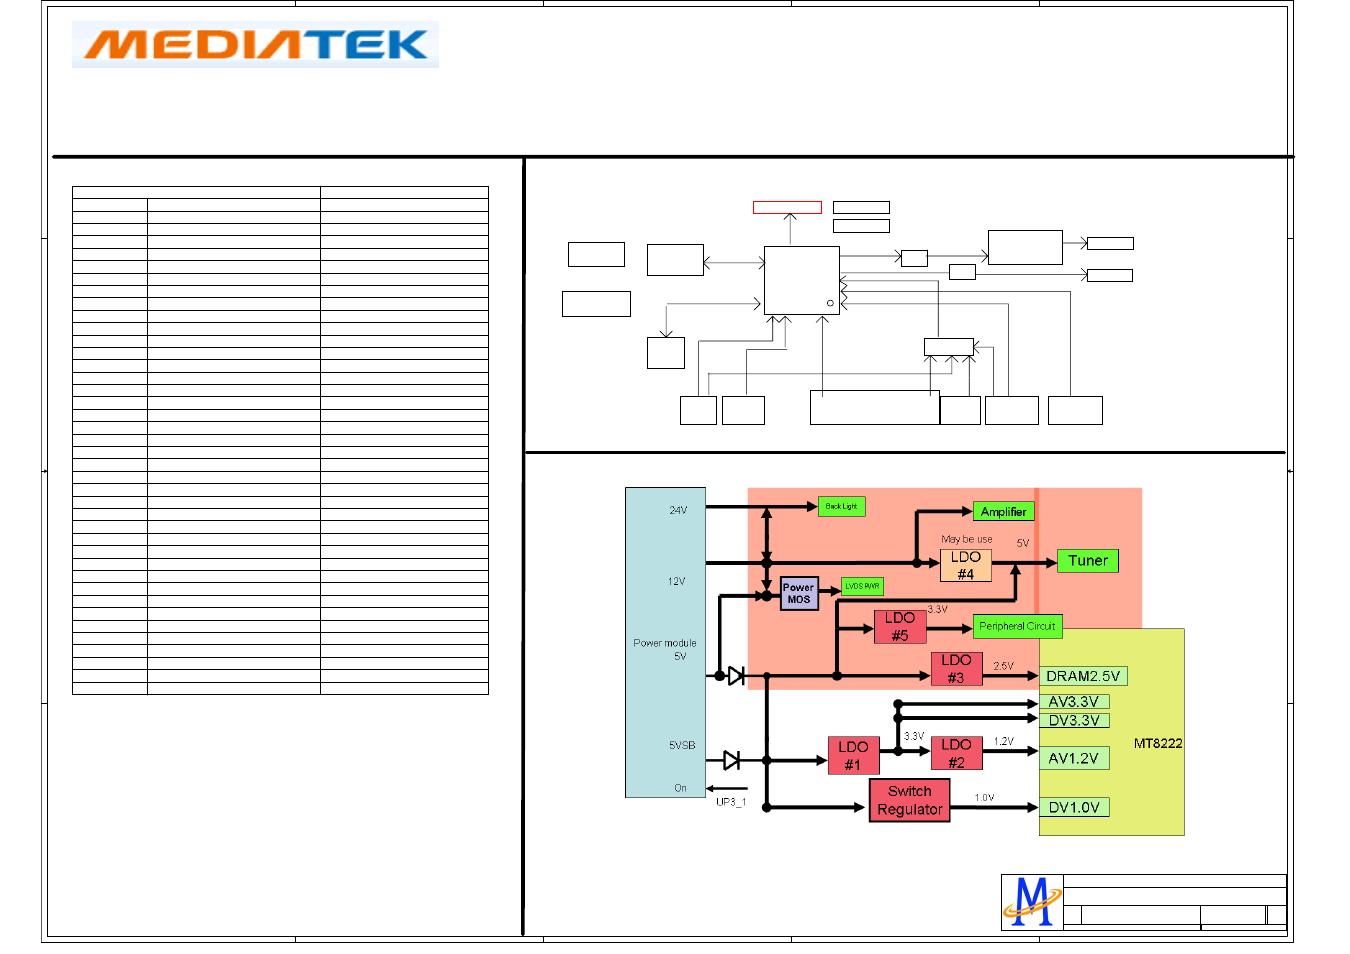 Ddr1 with termination ), Version v1 0, Mt8222 | Hisense